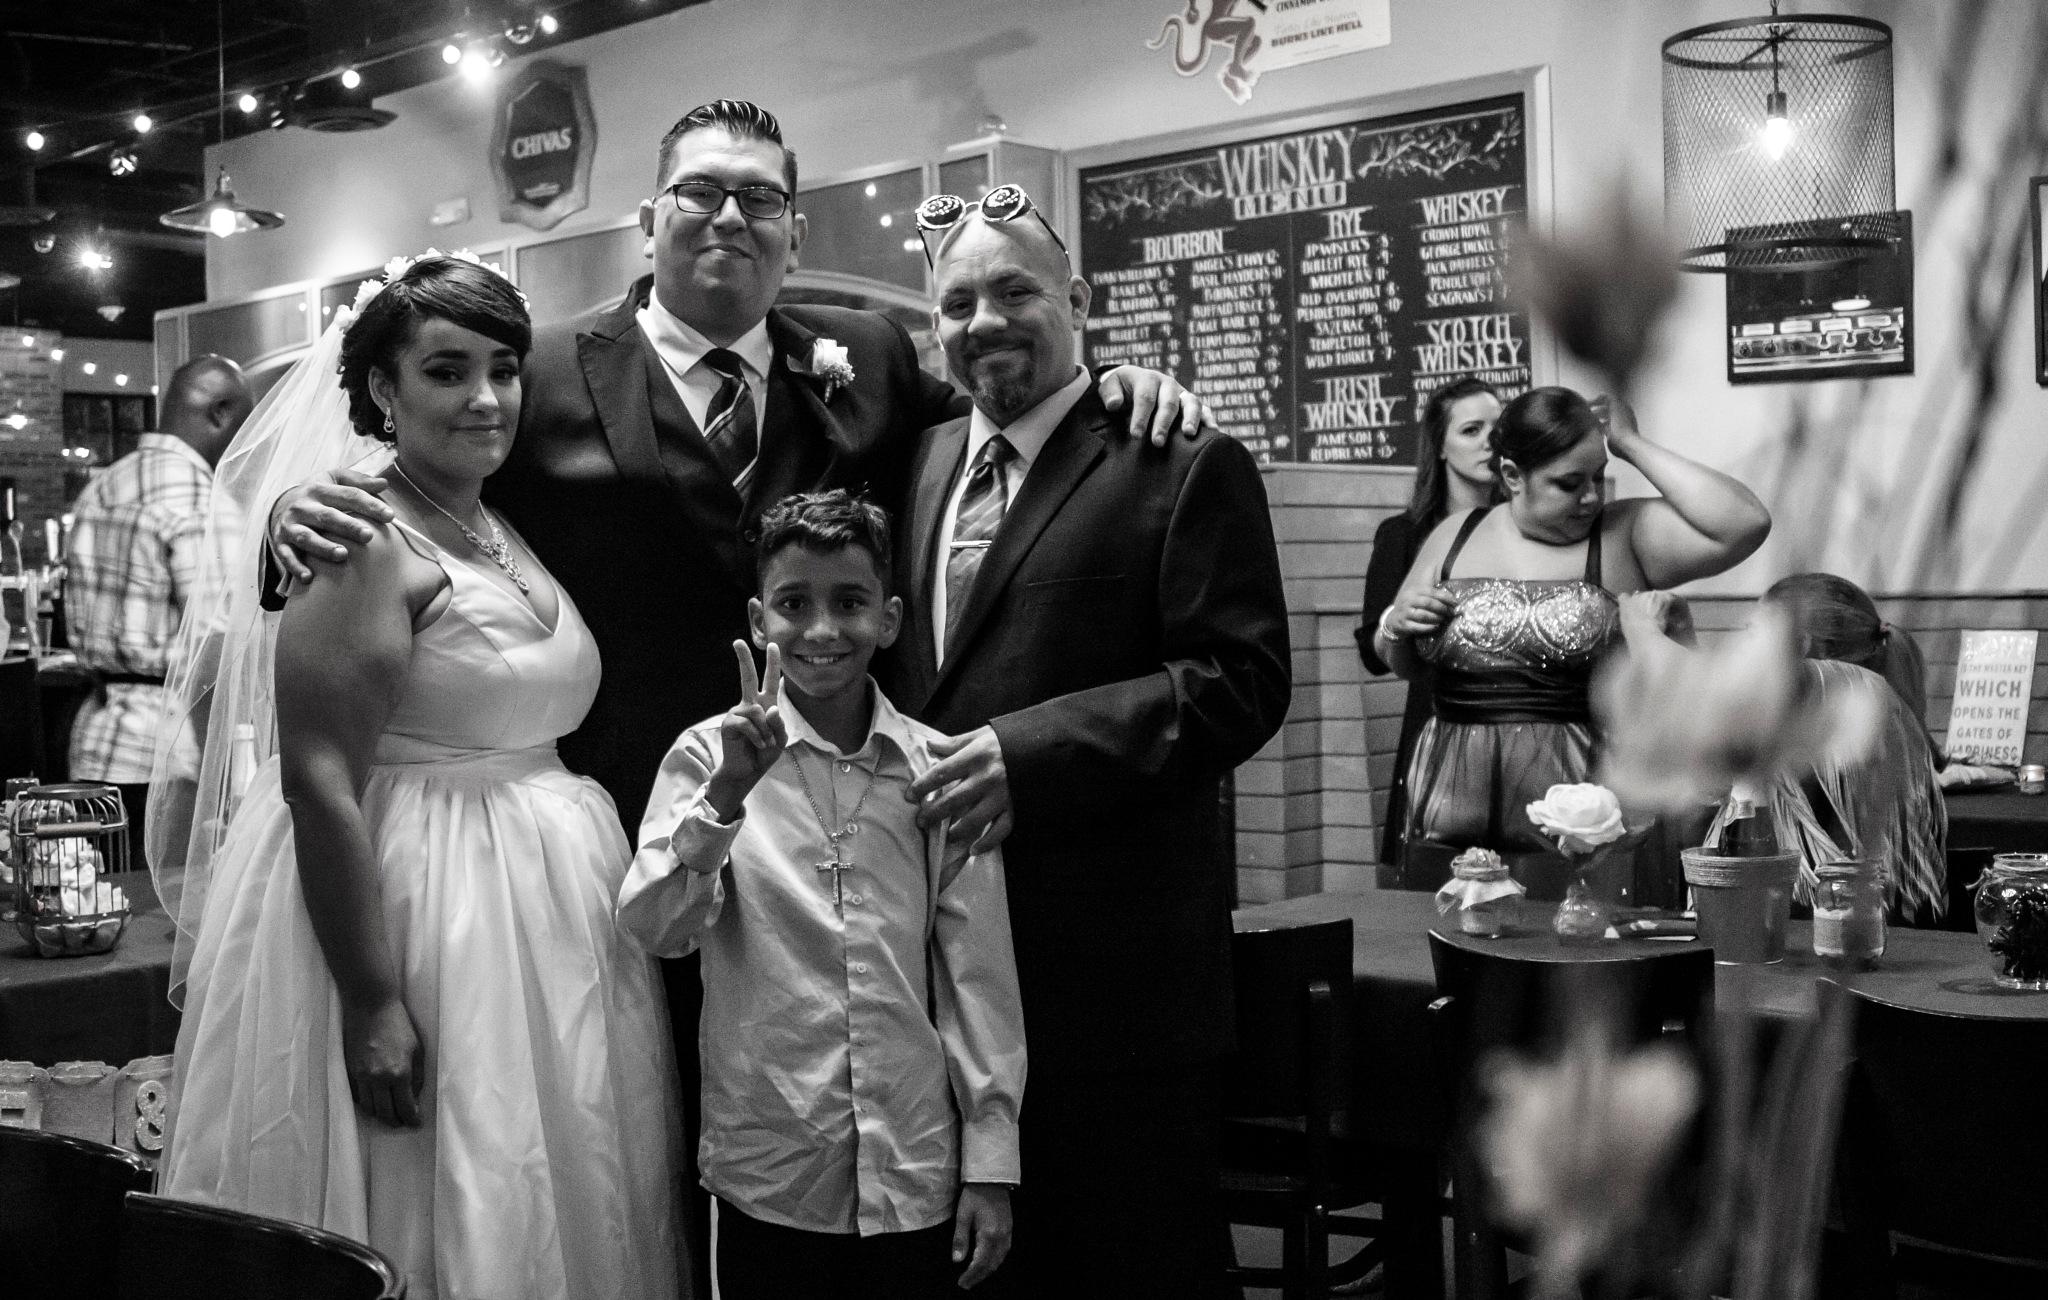 Family Portrait - Wedding Collection by JD3Studios l Joseph DeFalco III